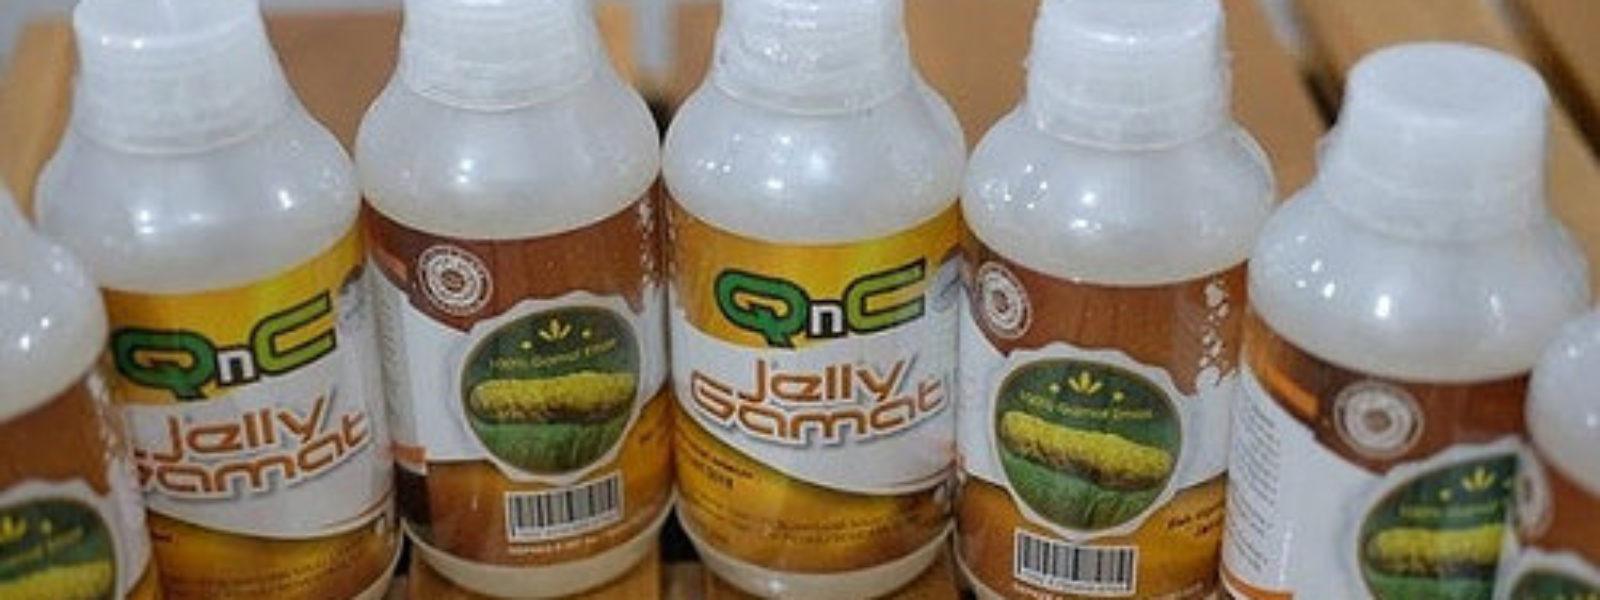 QNC Jelly Gamat Original Murah Hanya 145RIBU/BOTOL. BARANG SAMPAI BARU TRANSFER PEMBAYARAN!